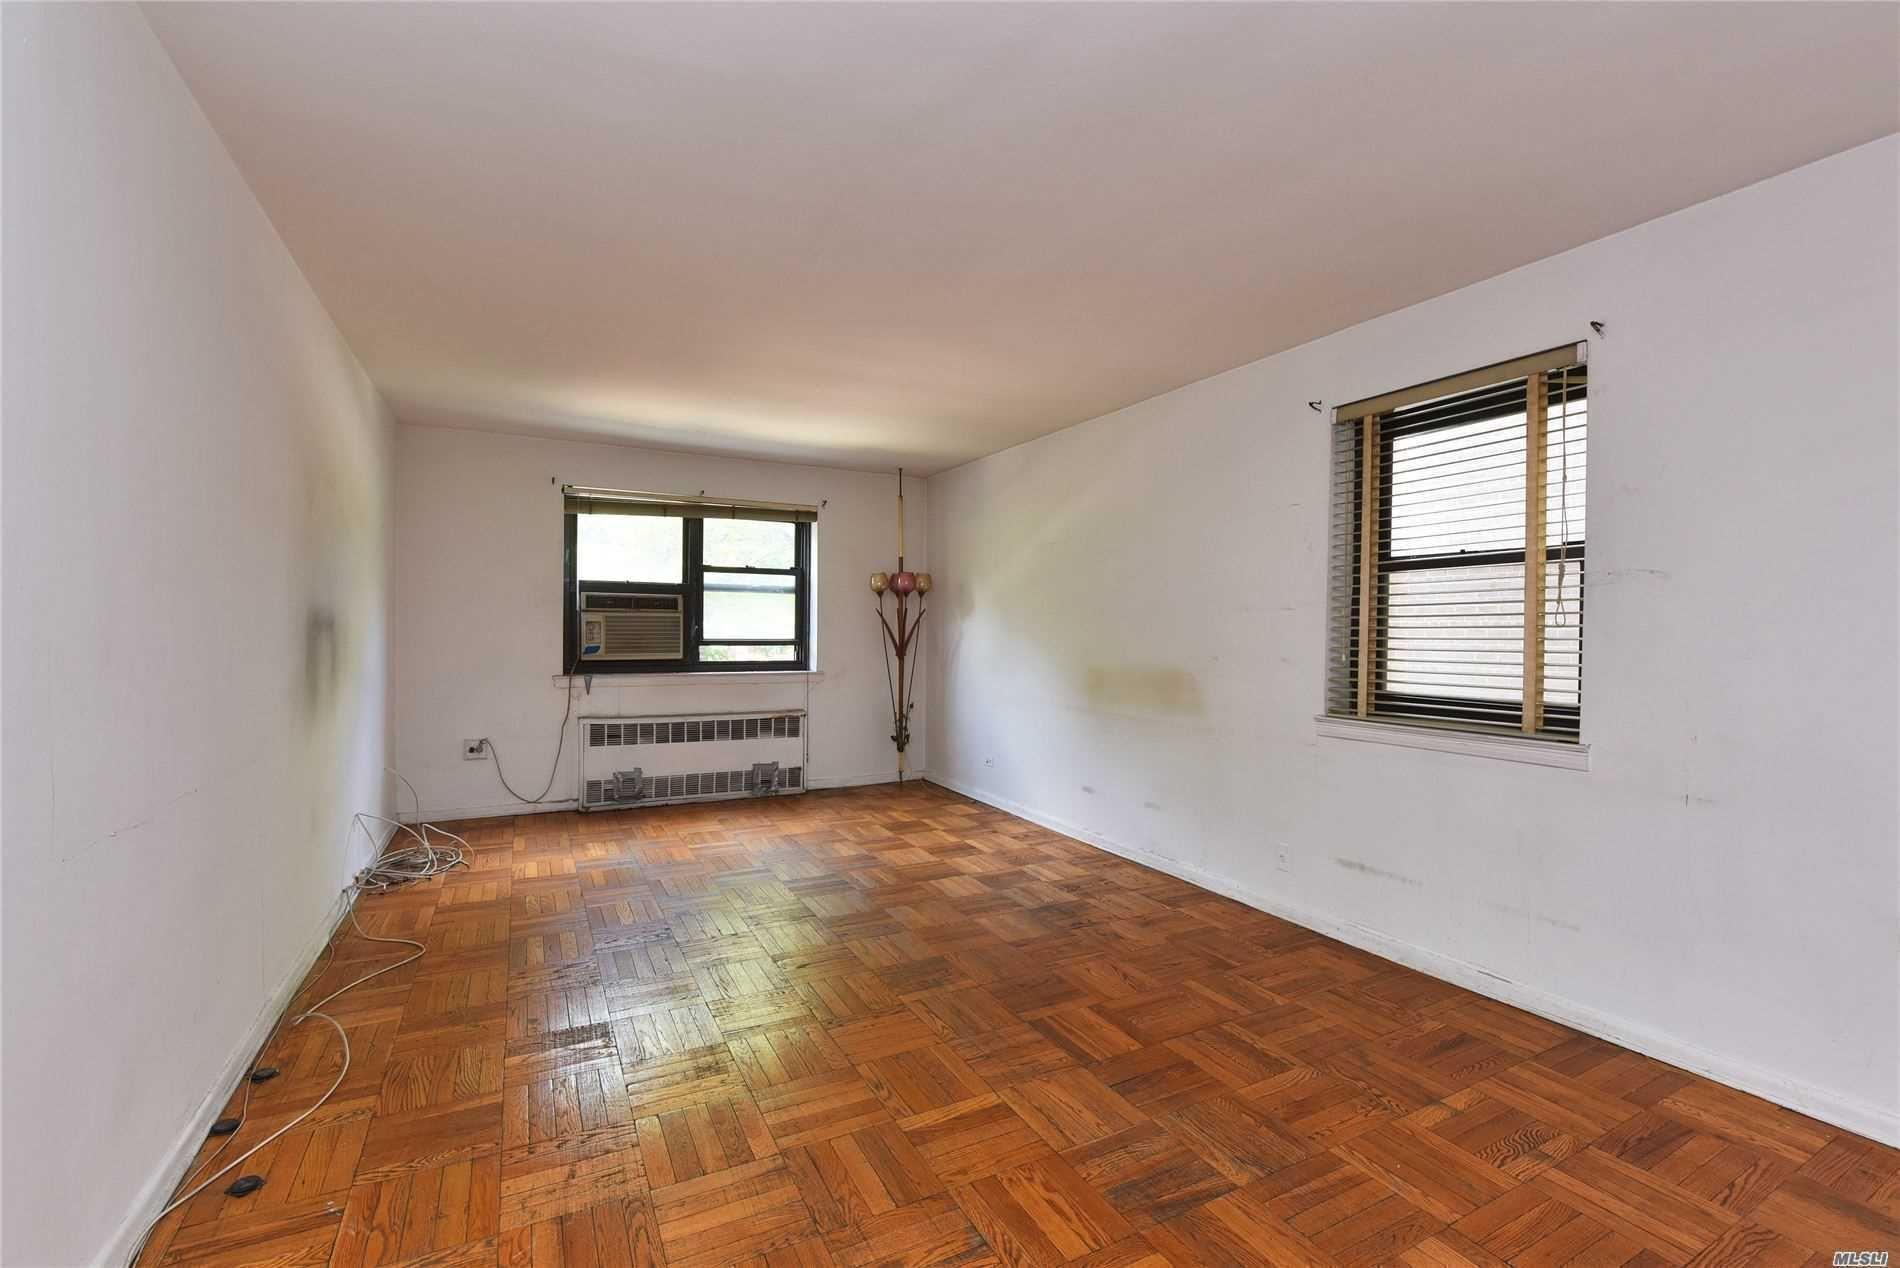 138-20 31 Road #1D, Flushing, NY 11354 - MLS#: 3149109